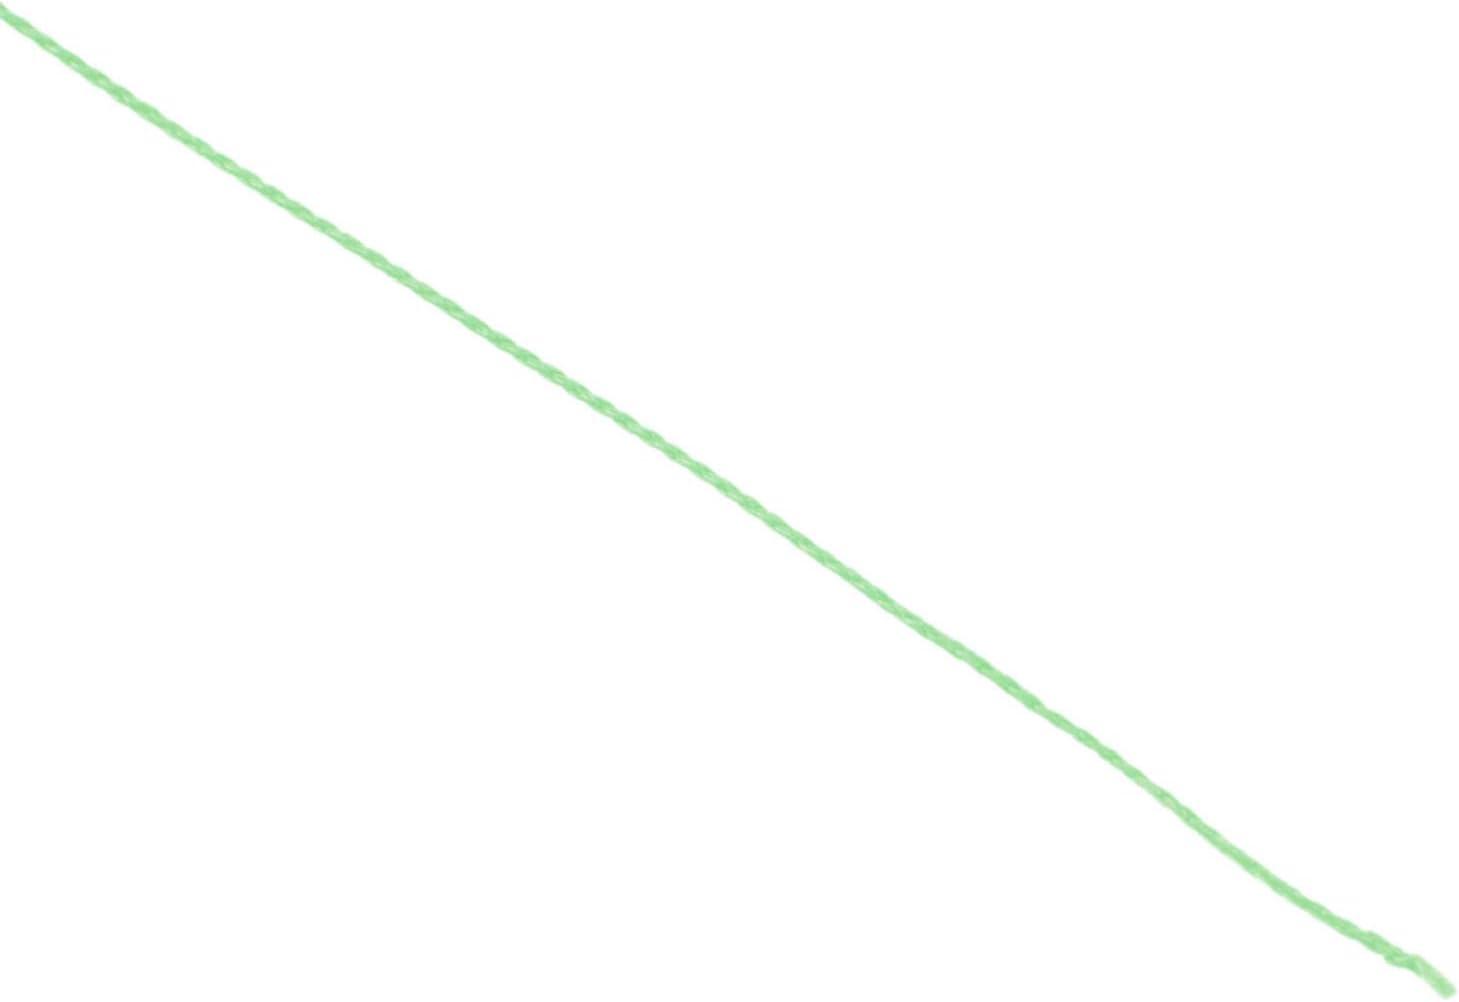 Light Green Andifany 500M 50LB Colorful 4 Strands Multifilament PE Braid Fishing Line